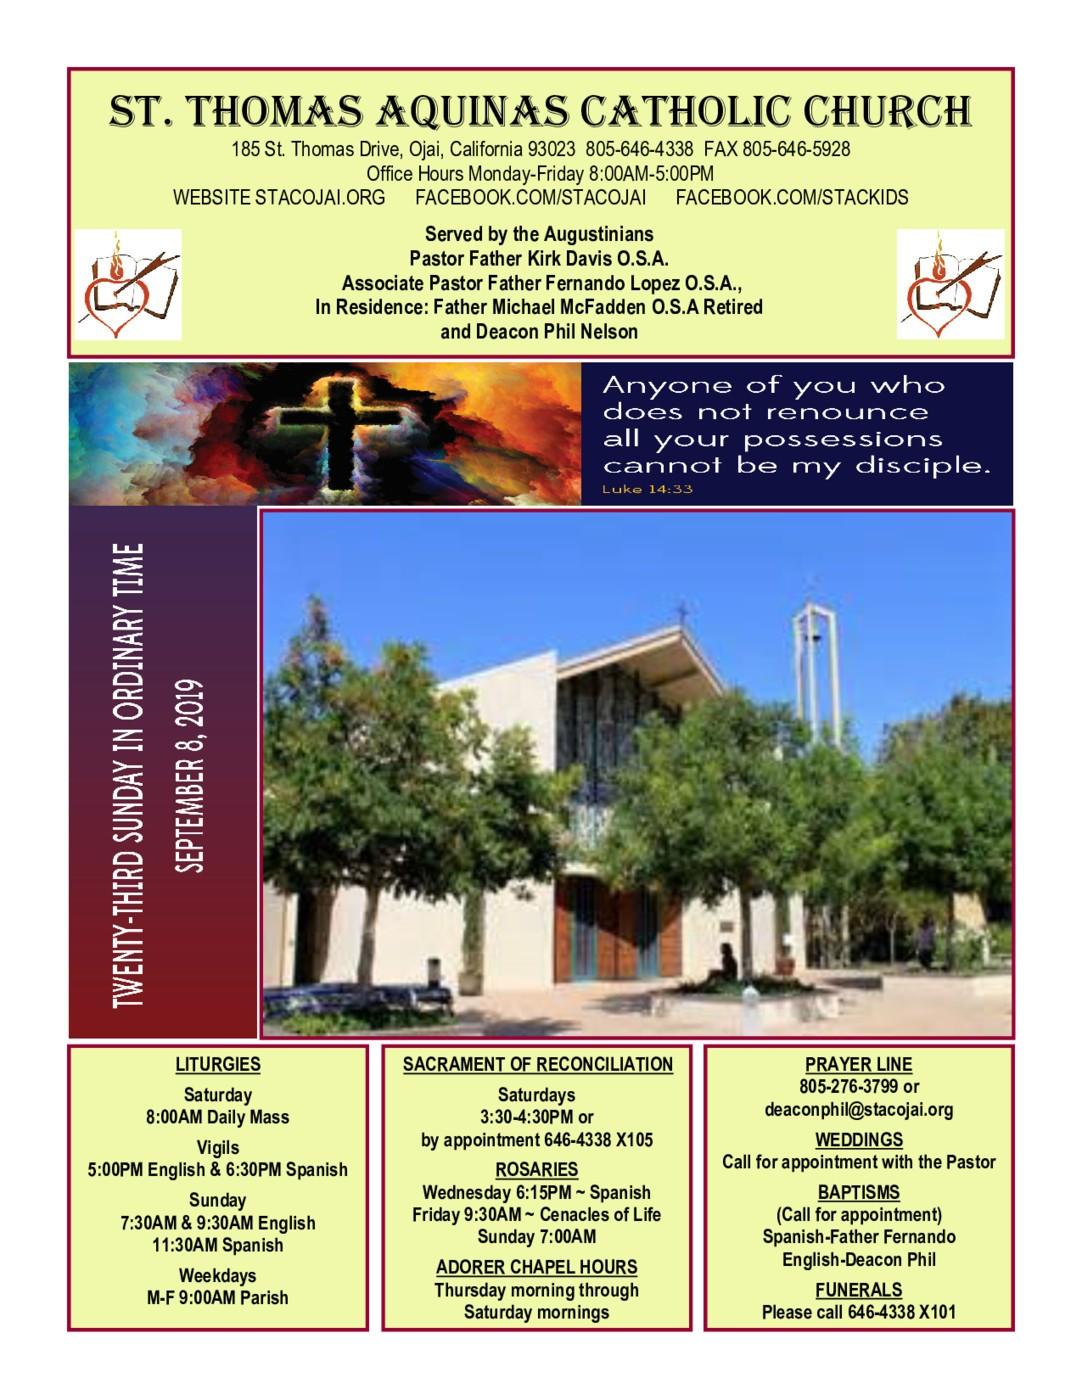 St  Thomas Aquinas Catholic Church - Ojai, CA | Served by